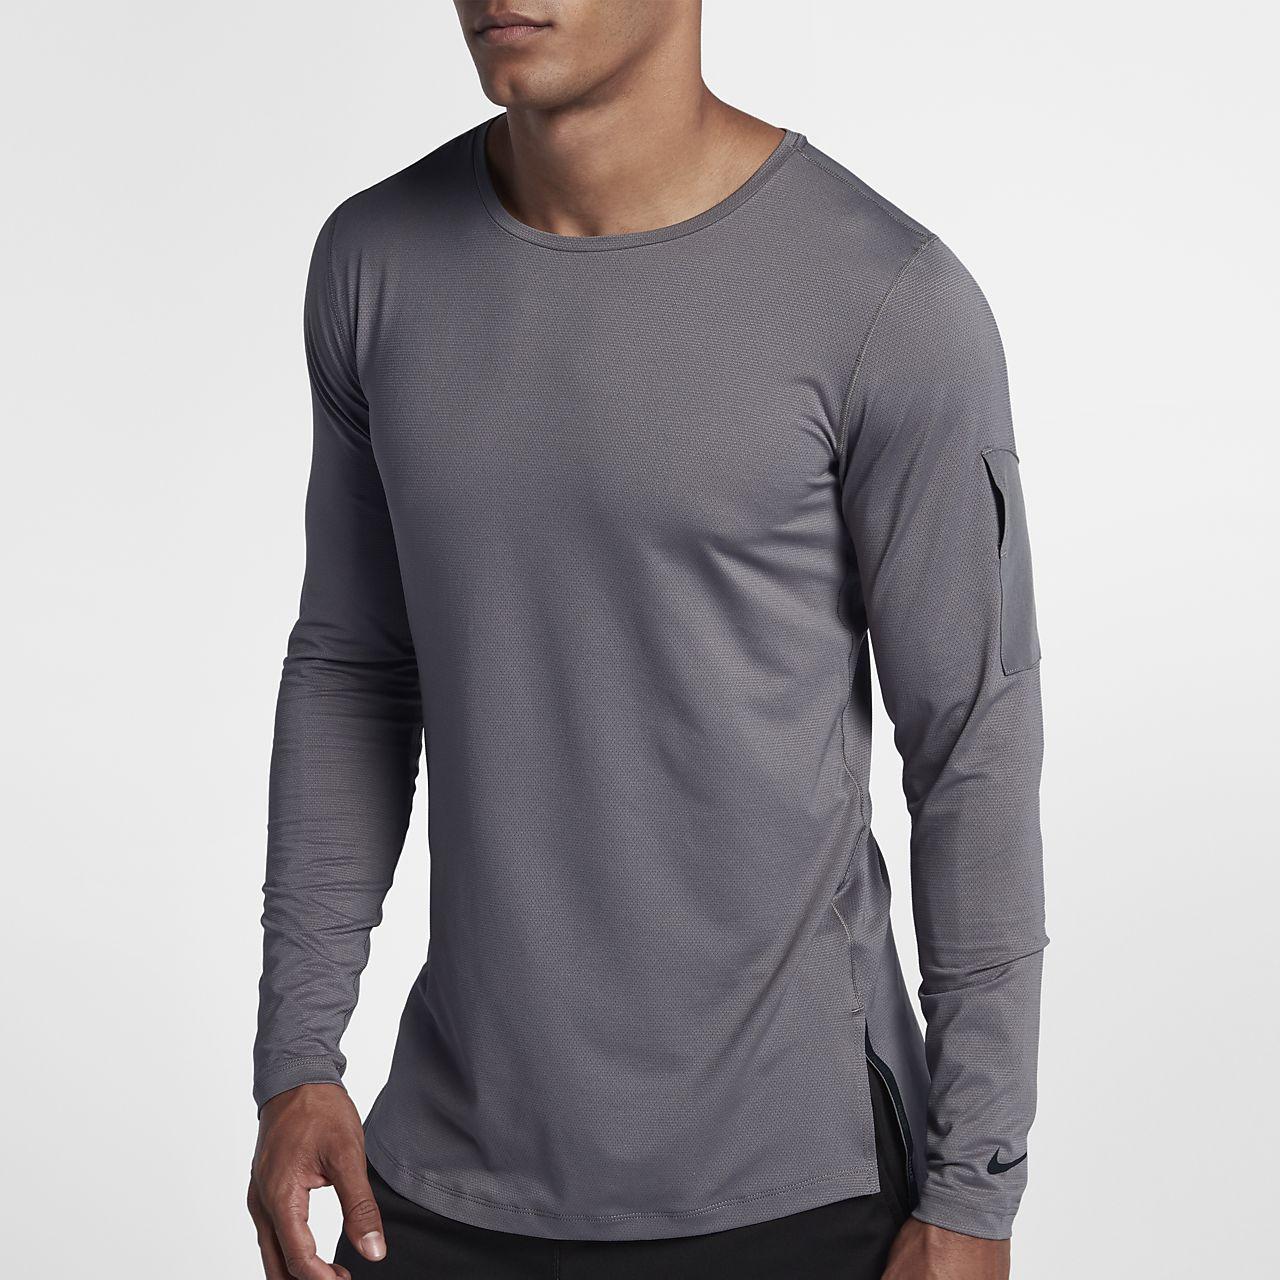 Nike Training Utility Men's Long Sleeve Top. Nike.com